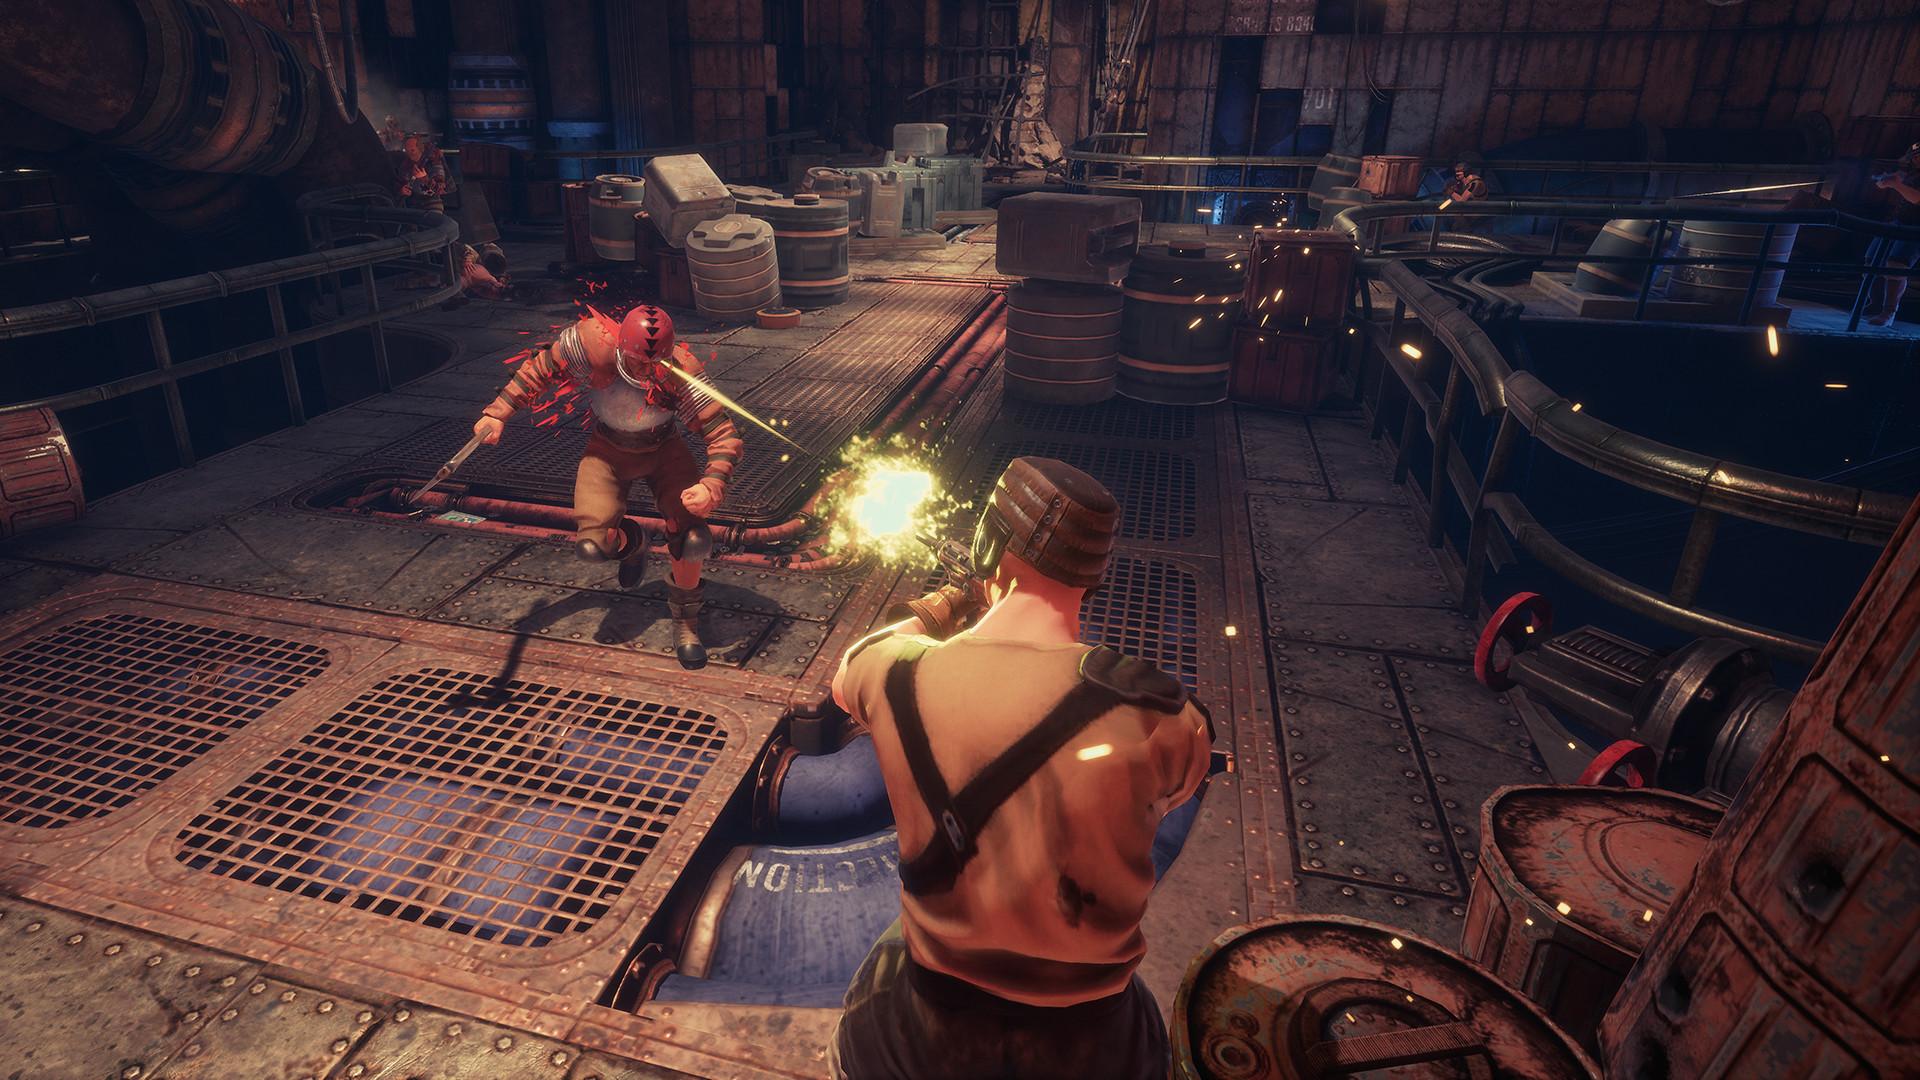 Insomnia: The Ark Screenshot 10 - Bilderquelle: HeroCraft